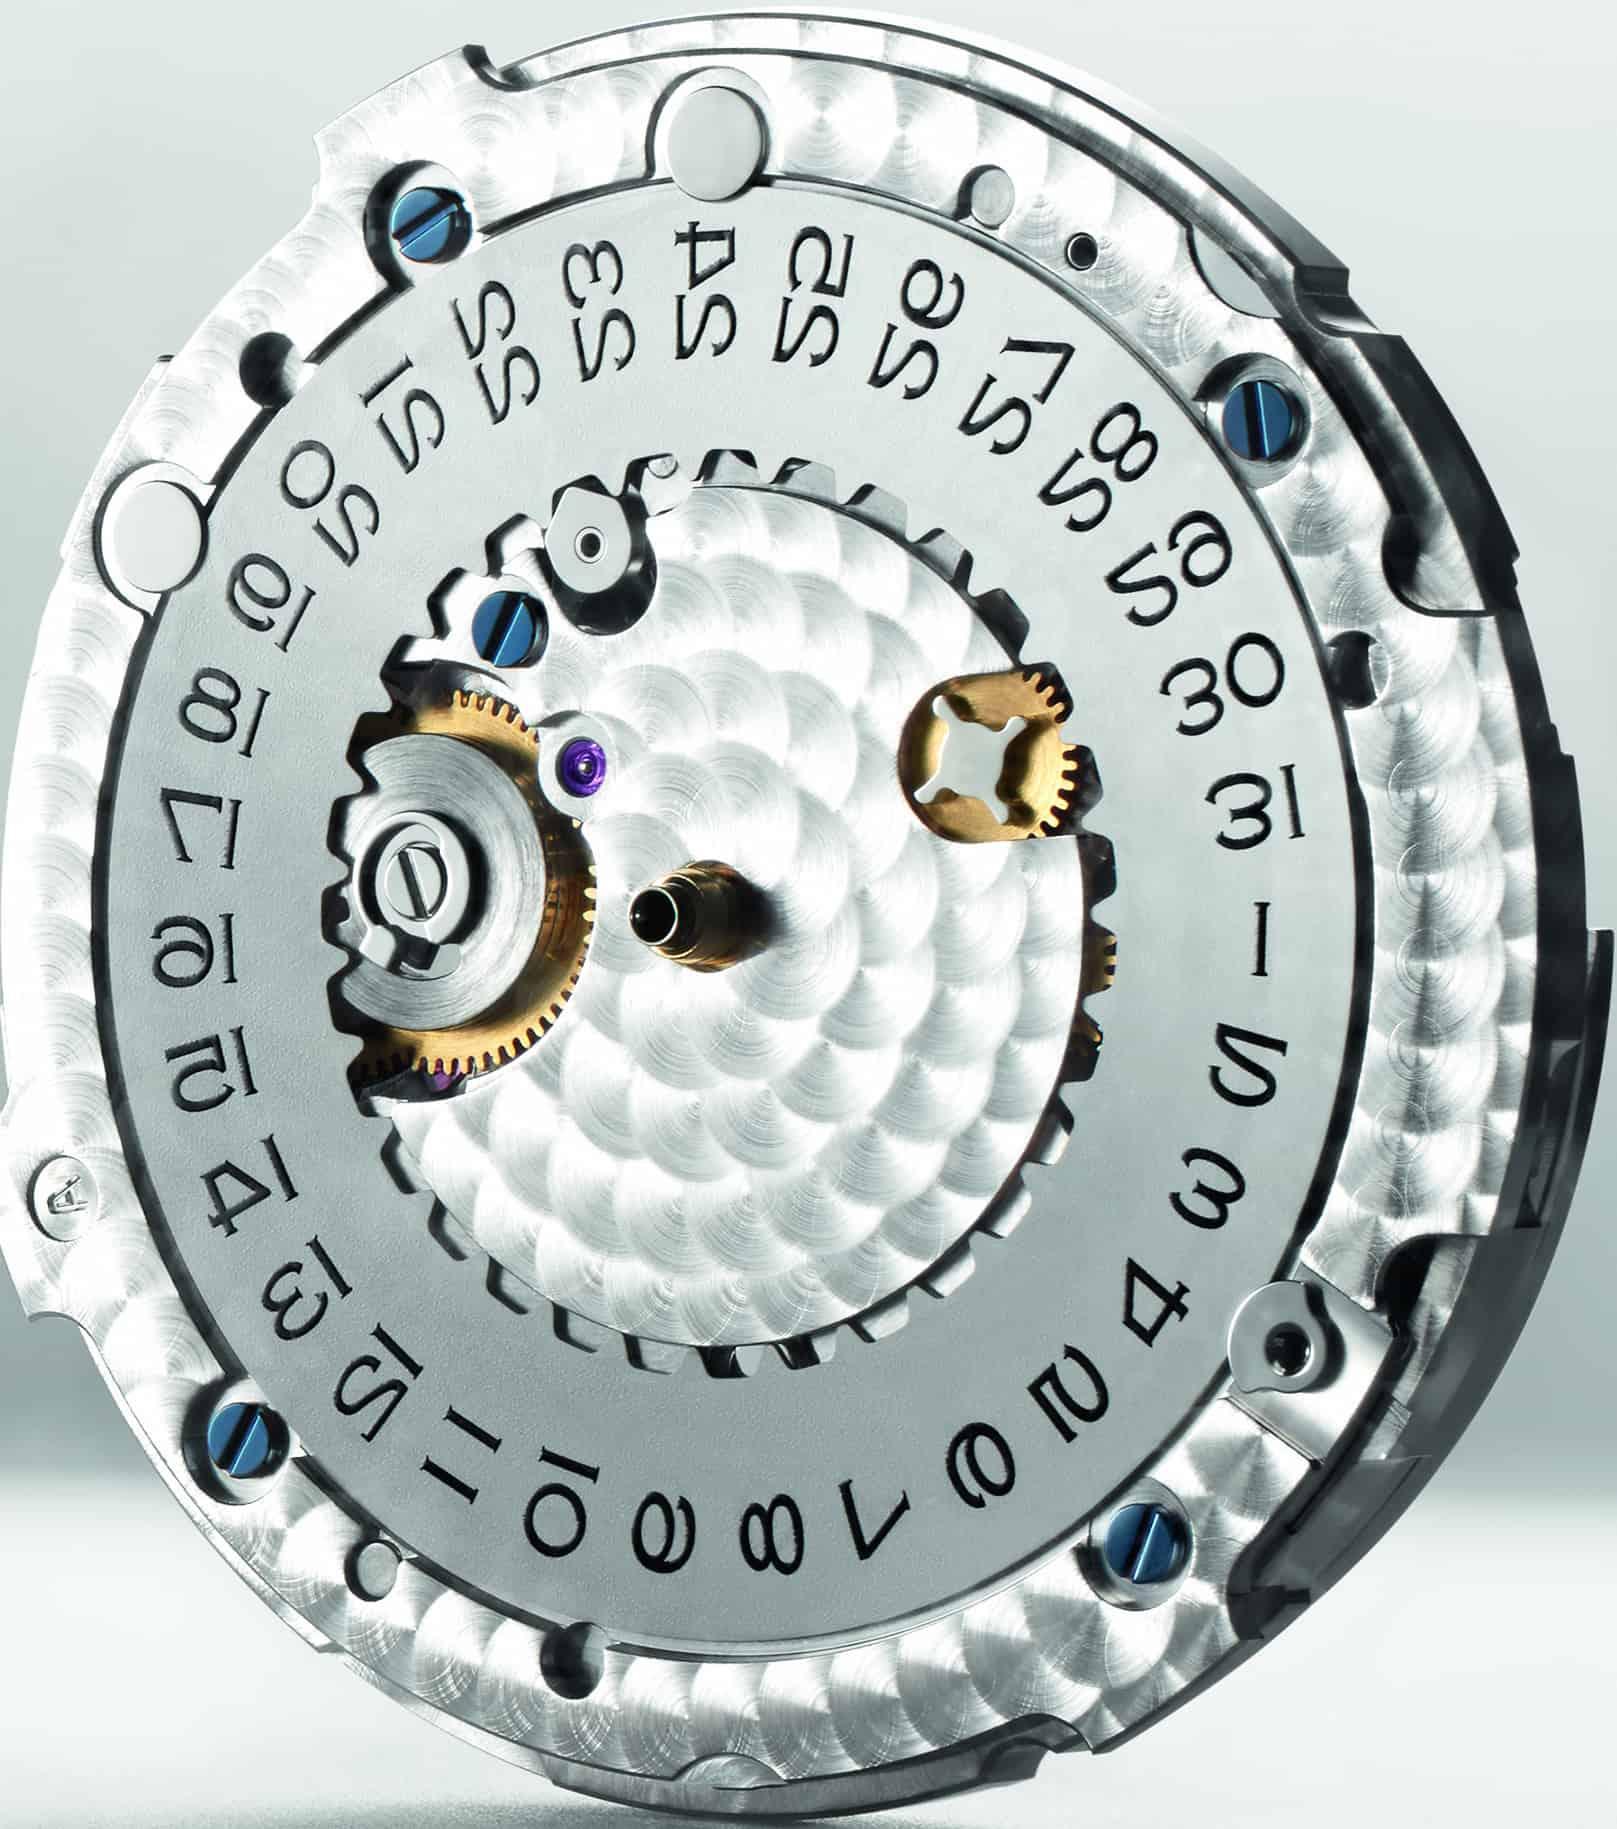 Der Datumsring des Rolex Kalibers 3235 dreht unter dem Zifferblatt